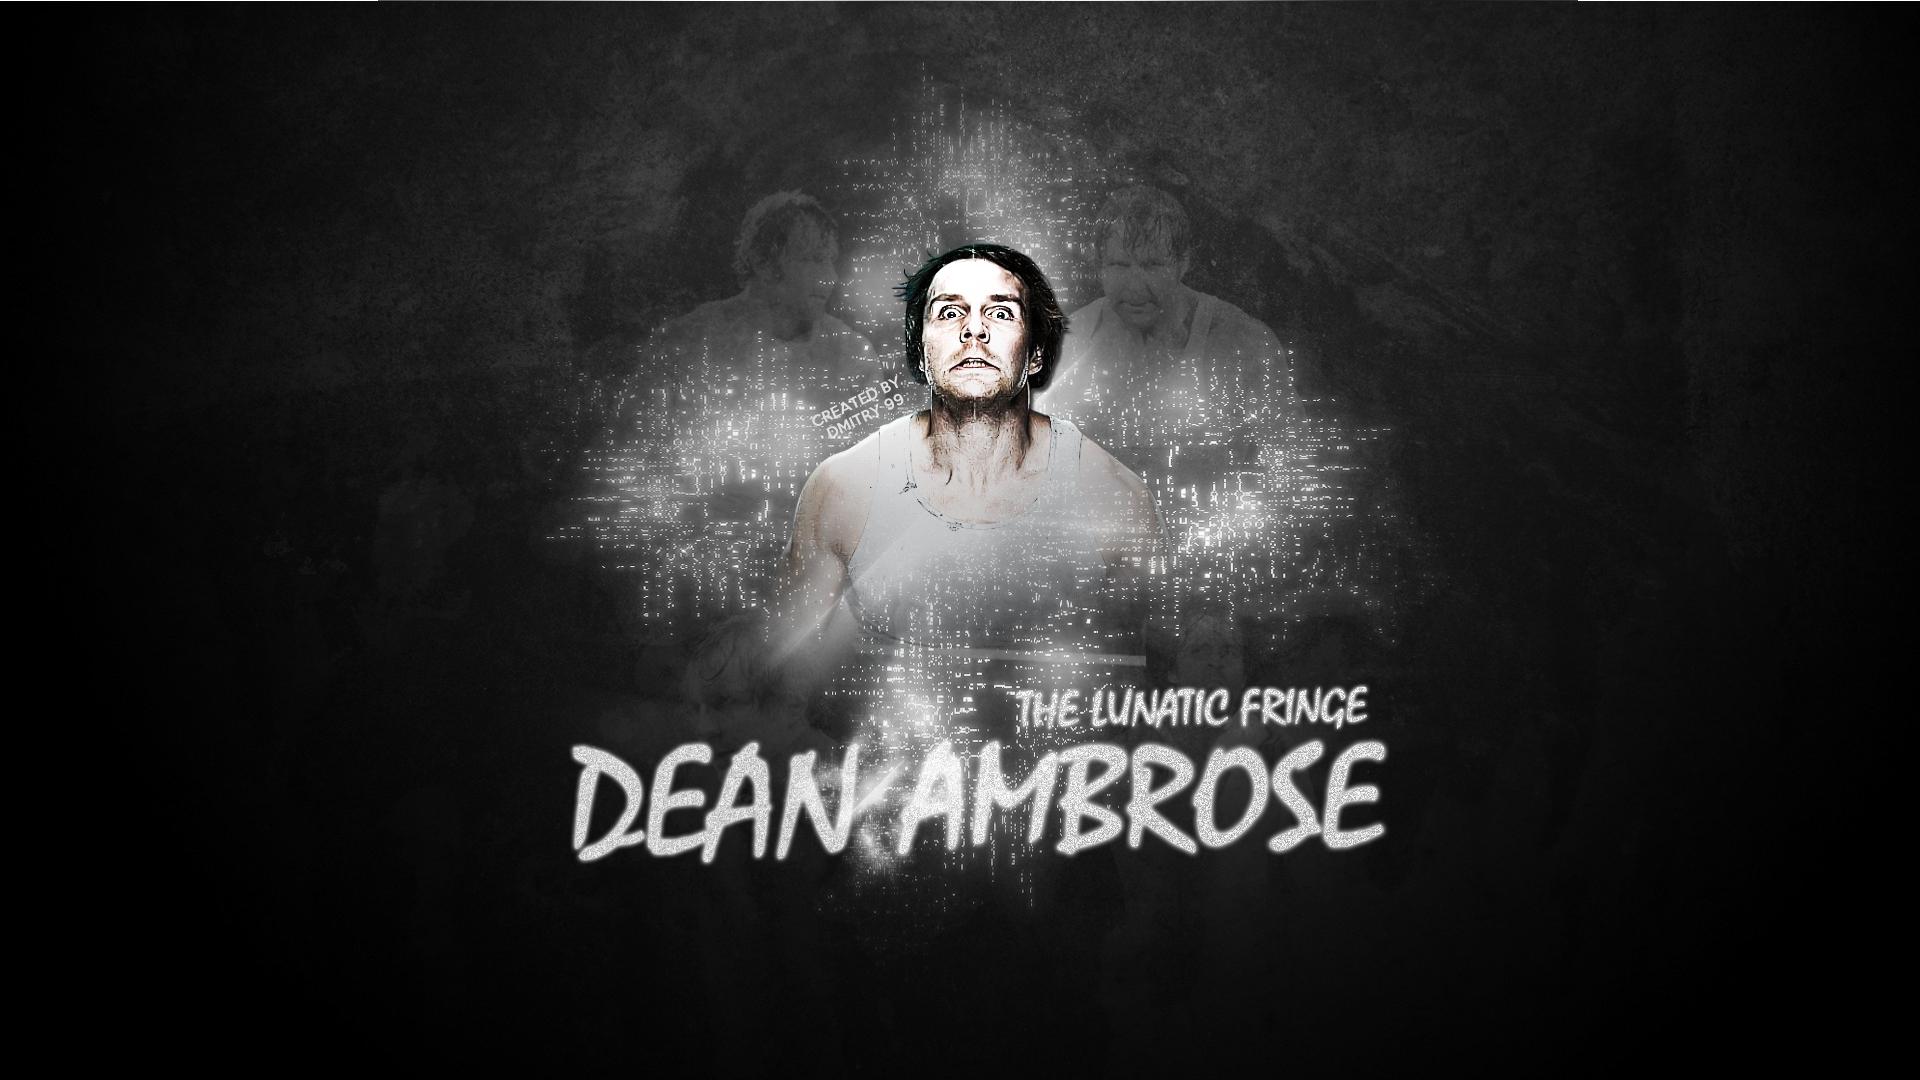 Dean Ambrose HD WallPaper by dmitrykozin99 1920x1080